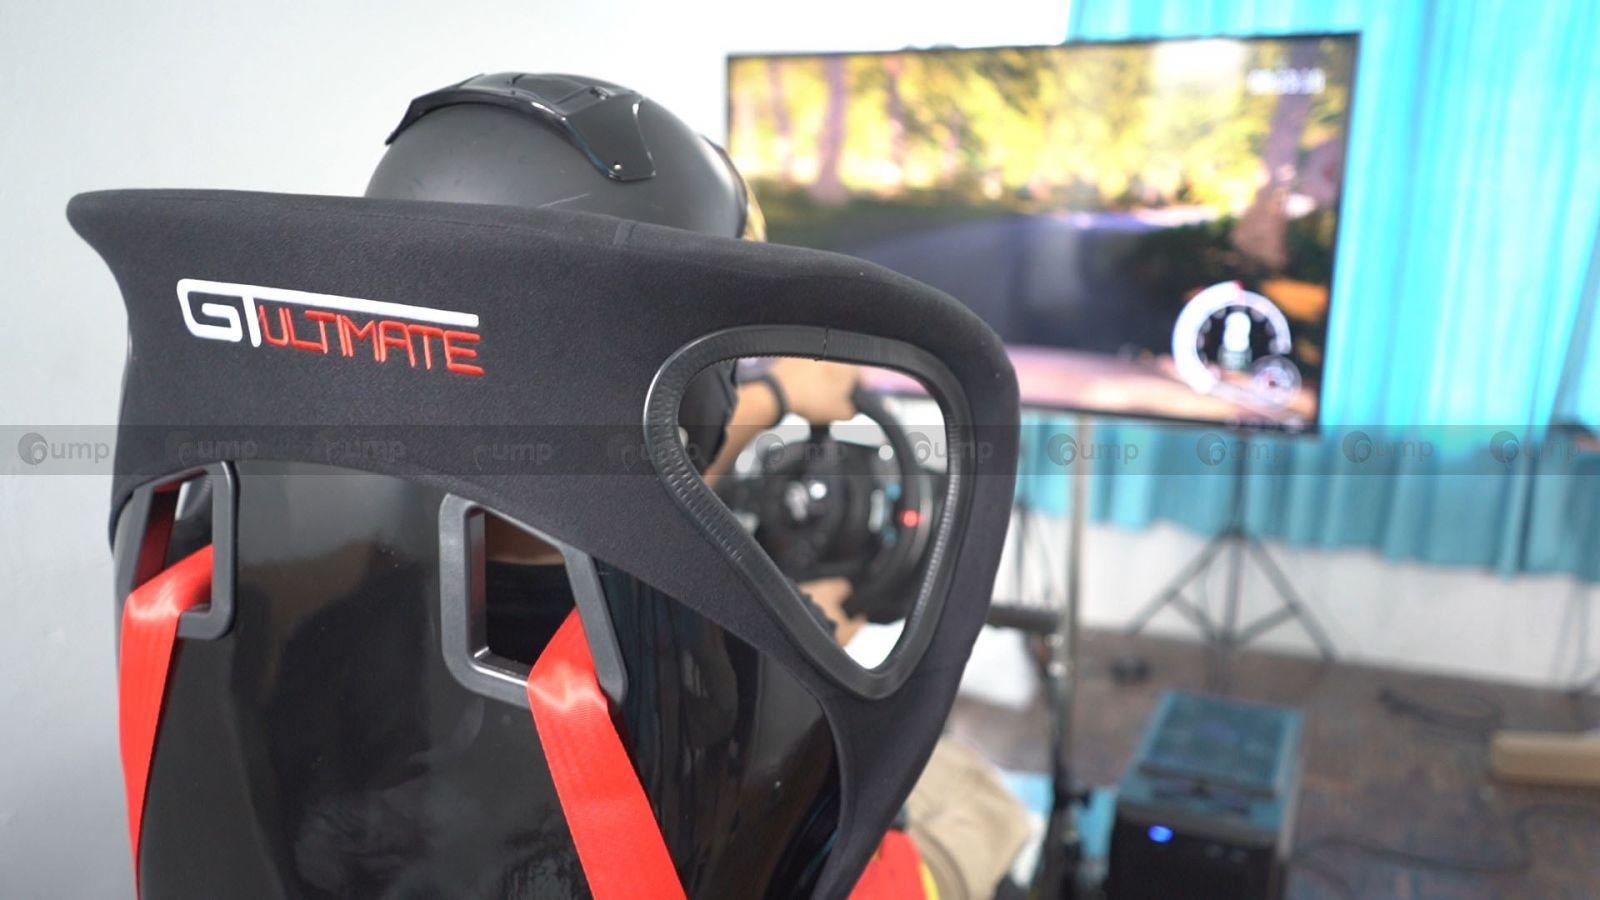 Review Next Level Racing Motion Platform V3 - GUMP IN TH